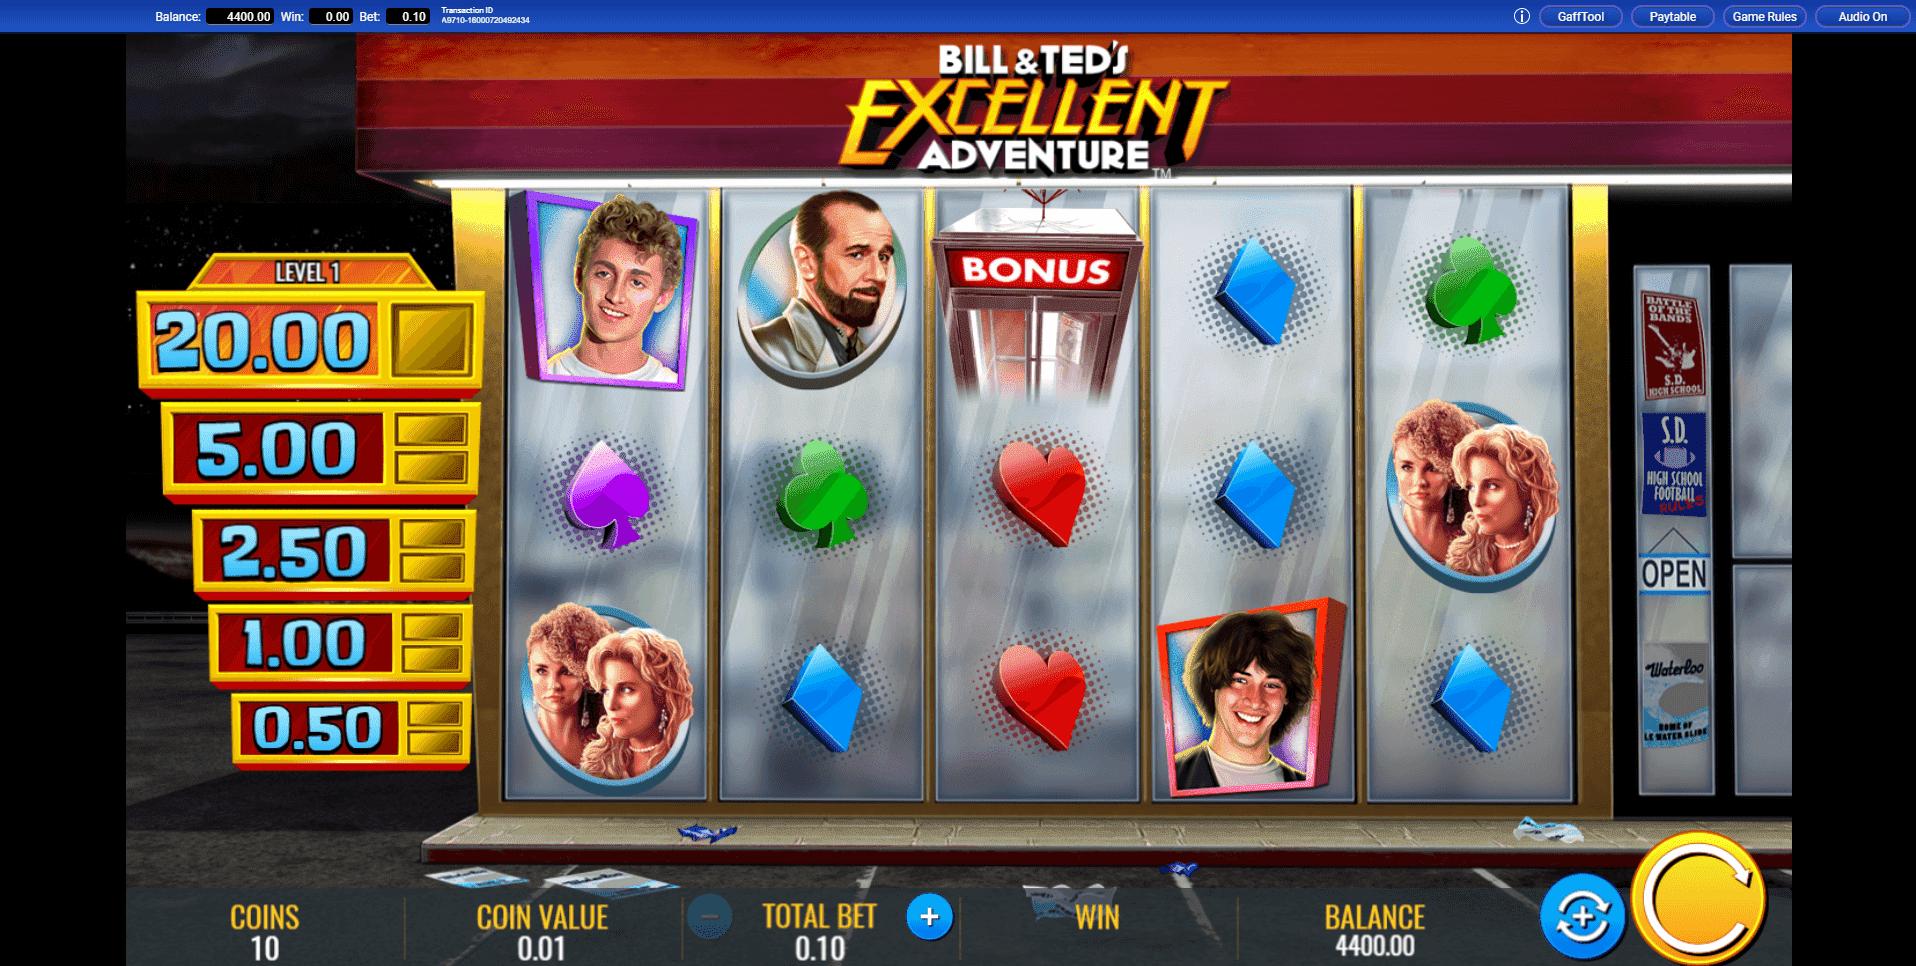 Bill Teds Excellent Adventure slot machine screenshot